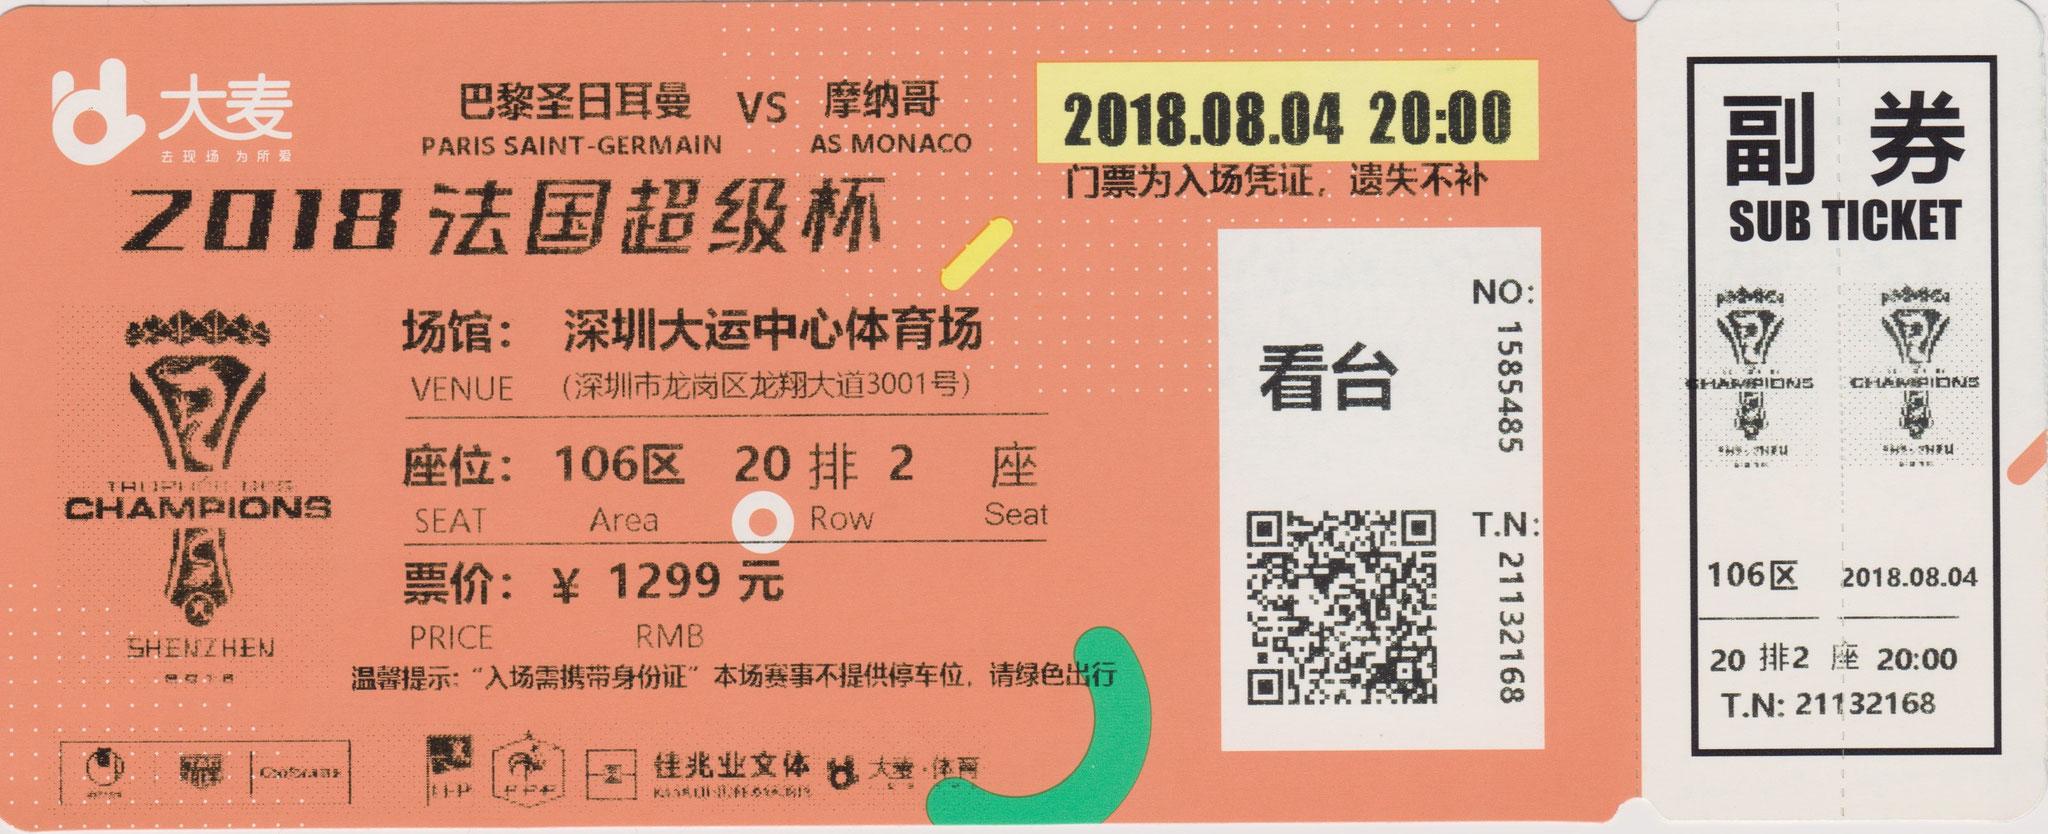 2019 à Senzhen :  Paris SG bat AS Monaco  4 - 0